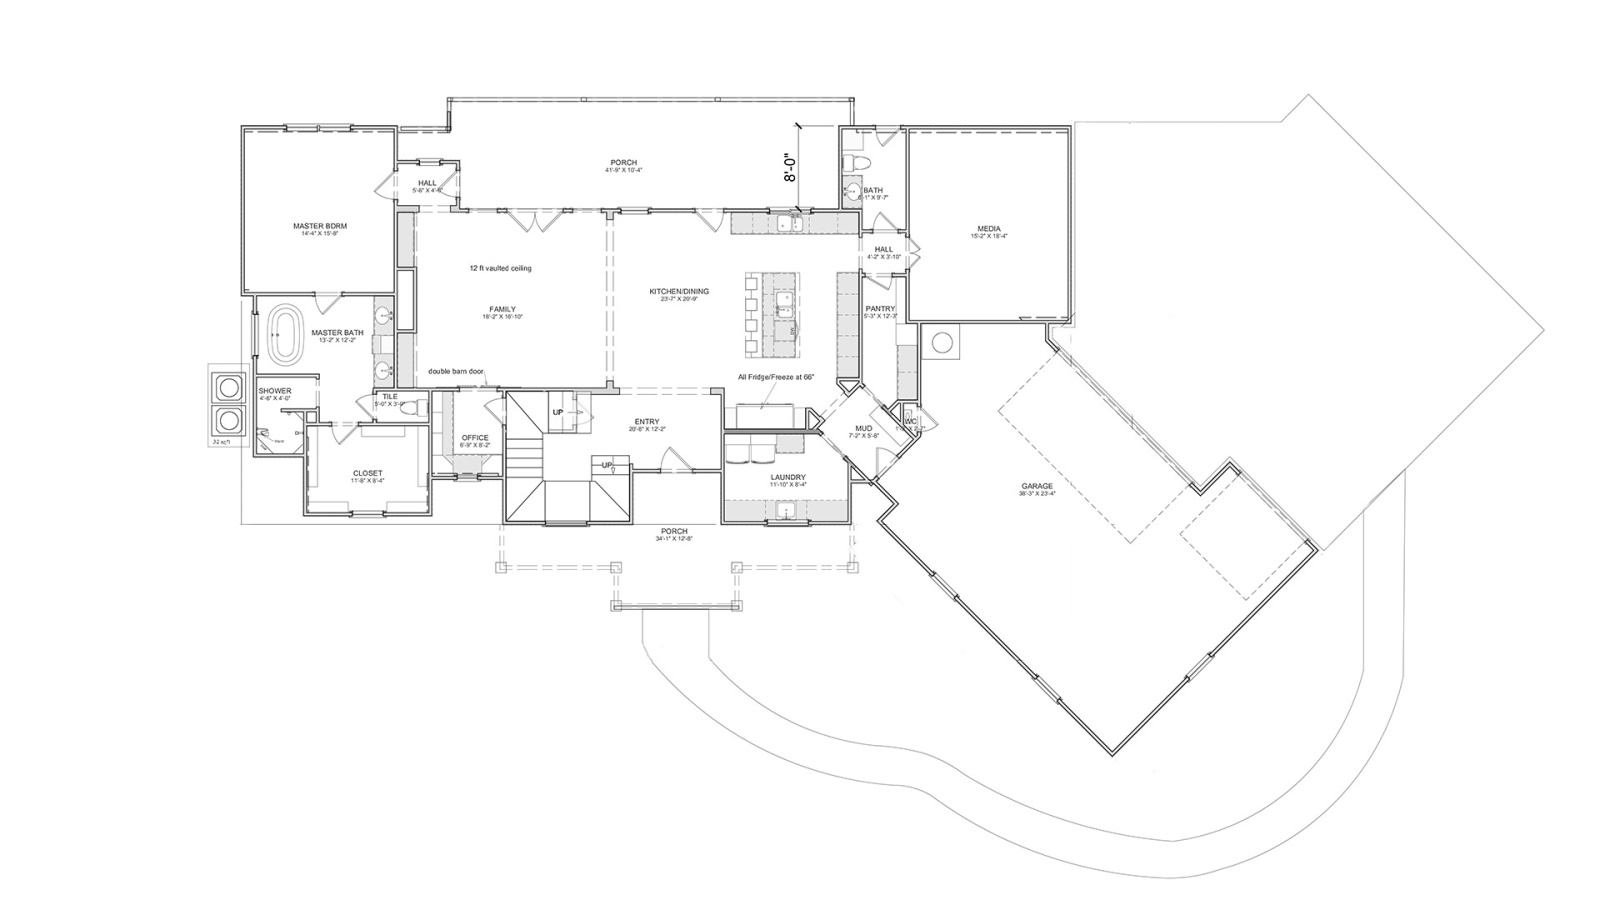 3 Bedrooms Bedrooms, ,3 BathroomsBathrooms,Custom Home,Featured Home Plans,1001